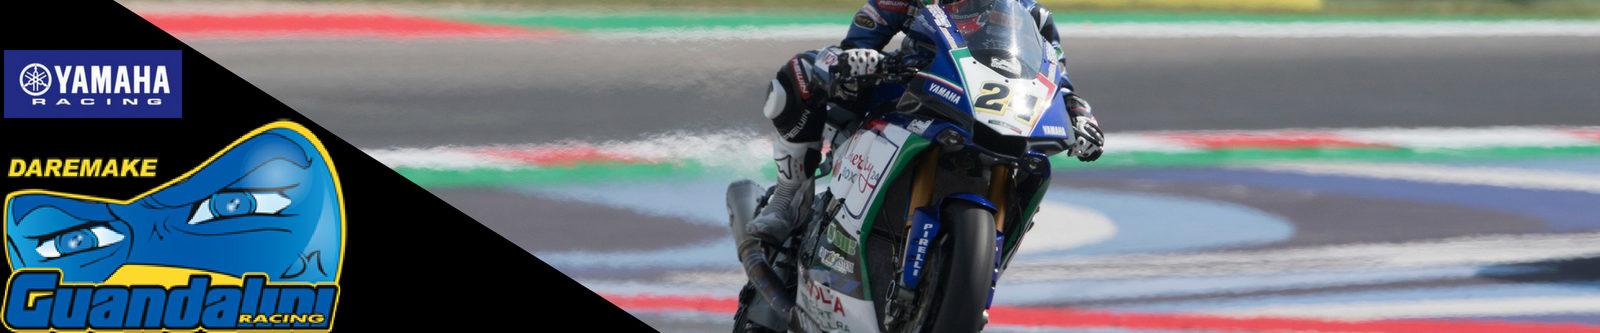 "Guandalini Racing conquista Tre punti in Gara 1.  ""Per Noi Il MondialeSBK Inizia da Qui"""